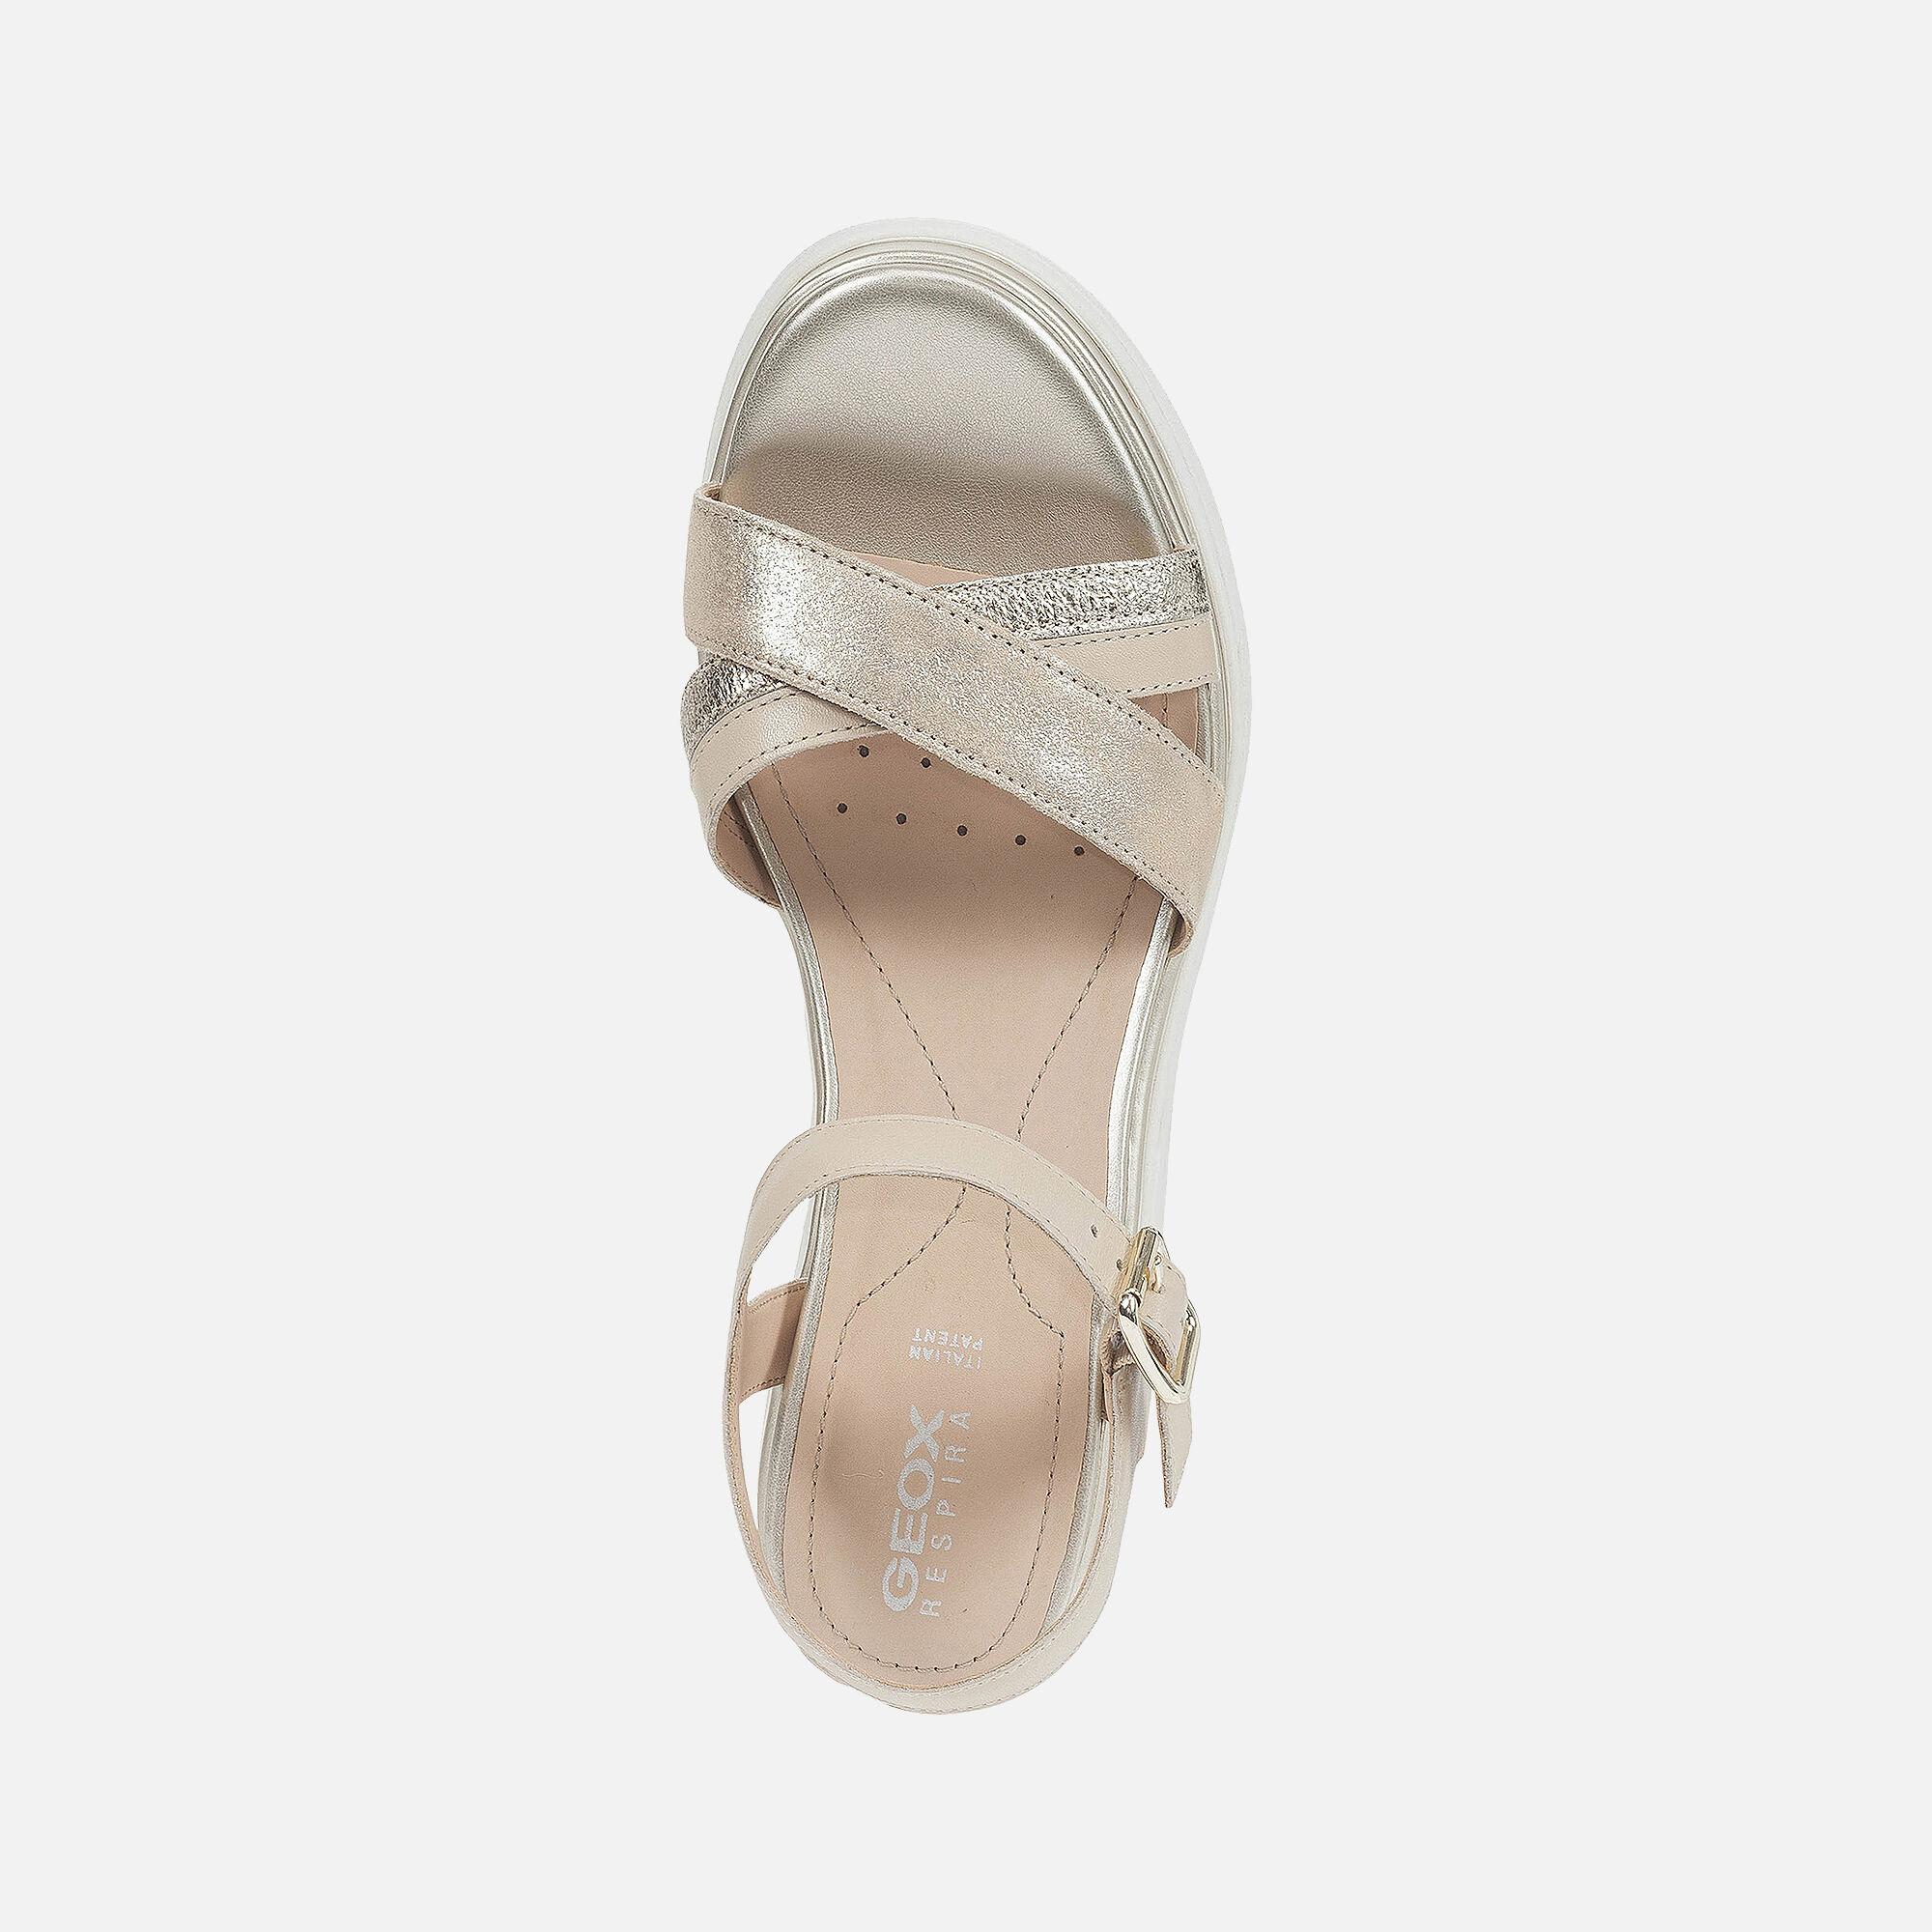 Geox GARDENIA Woman: Sand Sandals